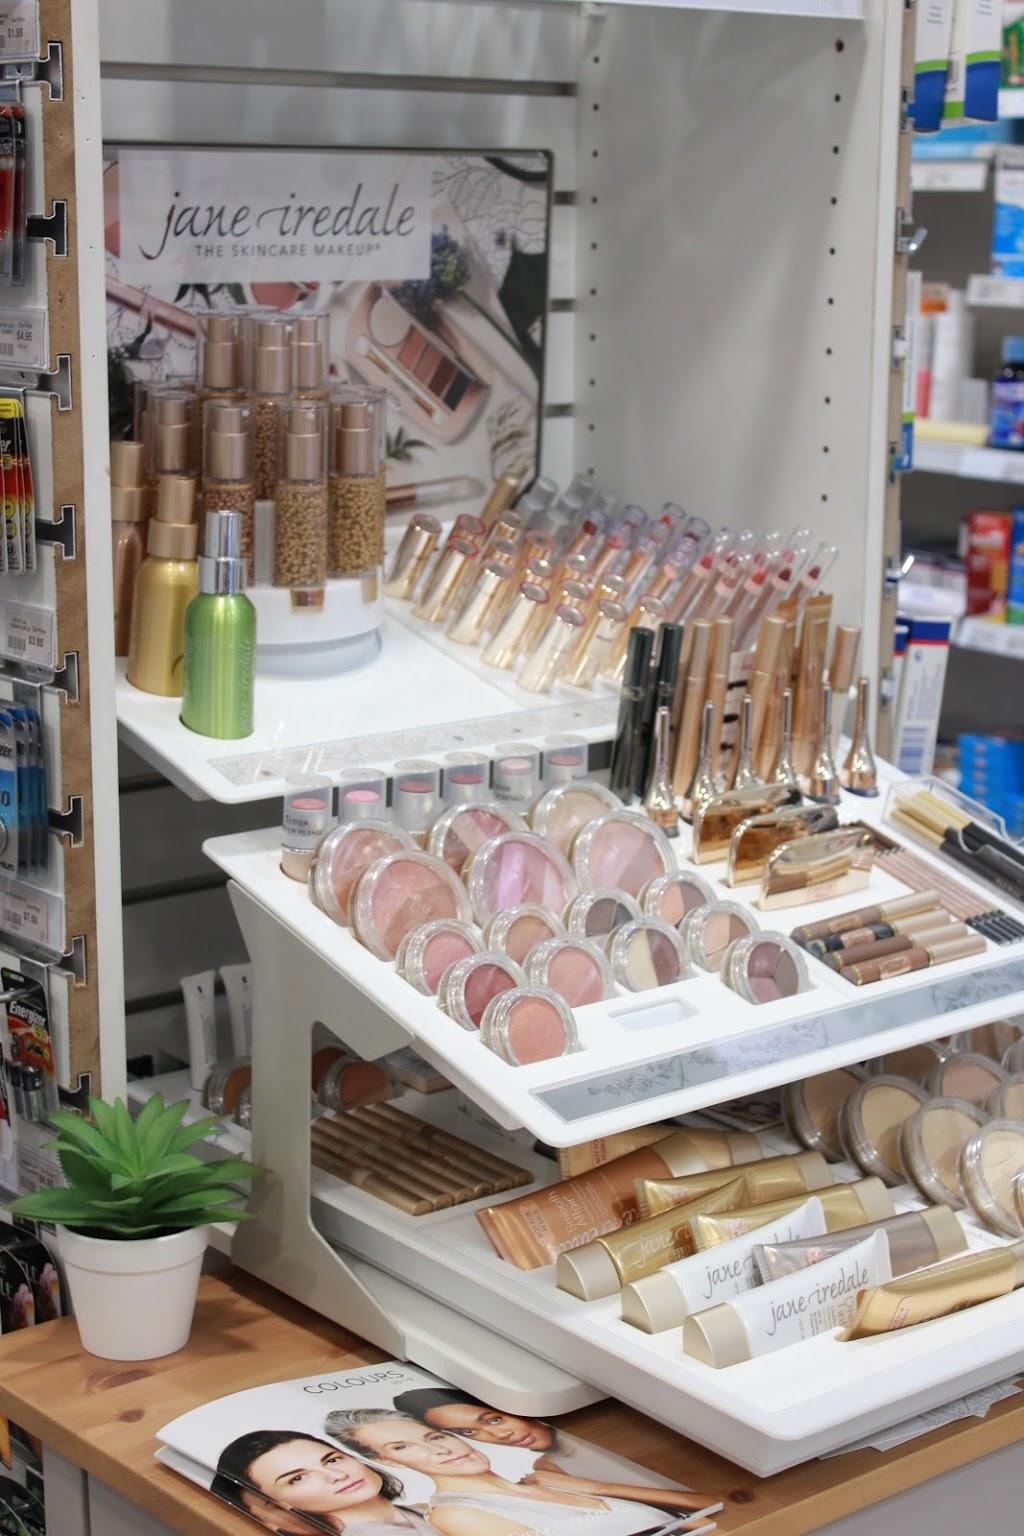 Balmain Compounding Pharmacy | pharmacy | 298 Darling St, Balmain NSW 2041, Australia | 0298185822 OR +61 2 9818 5822